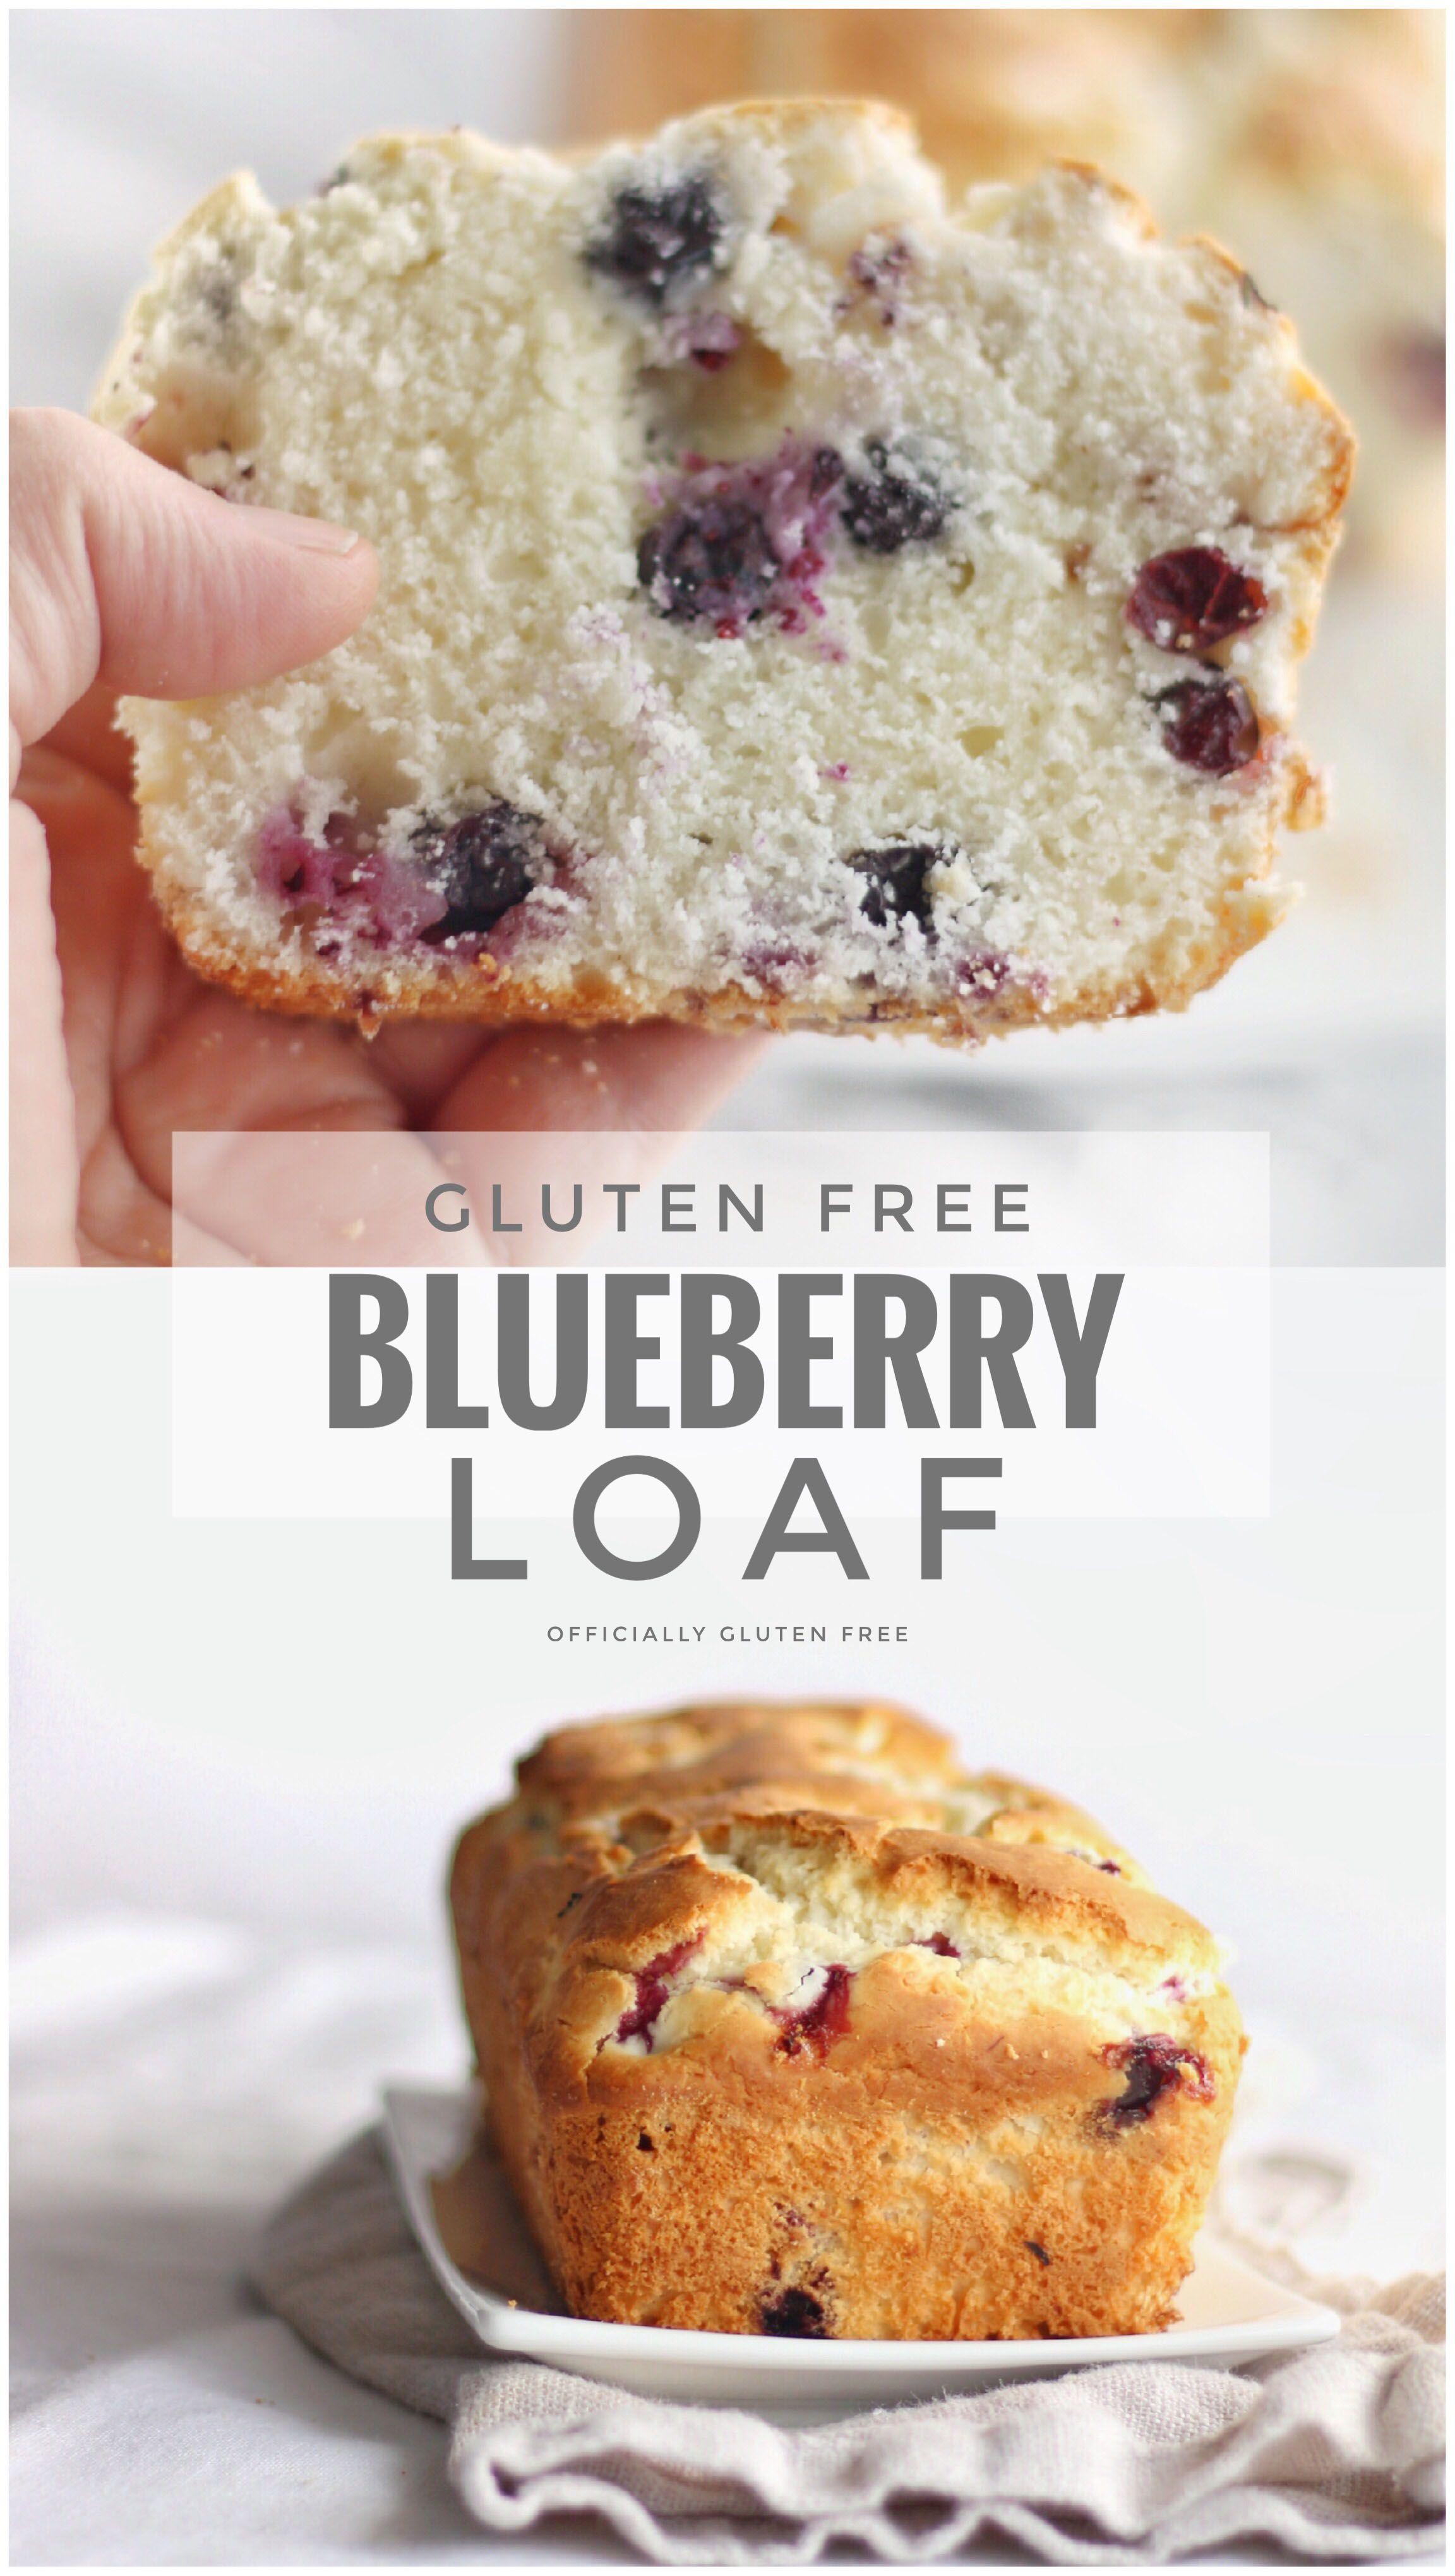 Gluten Free Blueberry Loaf Recipe Sour Cream Blueberry Bread Recipe Blueberry Loaf Gluten Free Blueberry Blueberry Bread